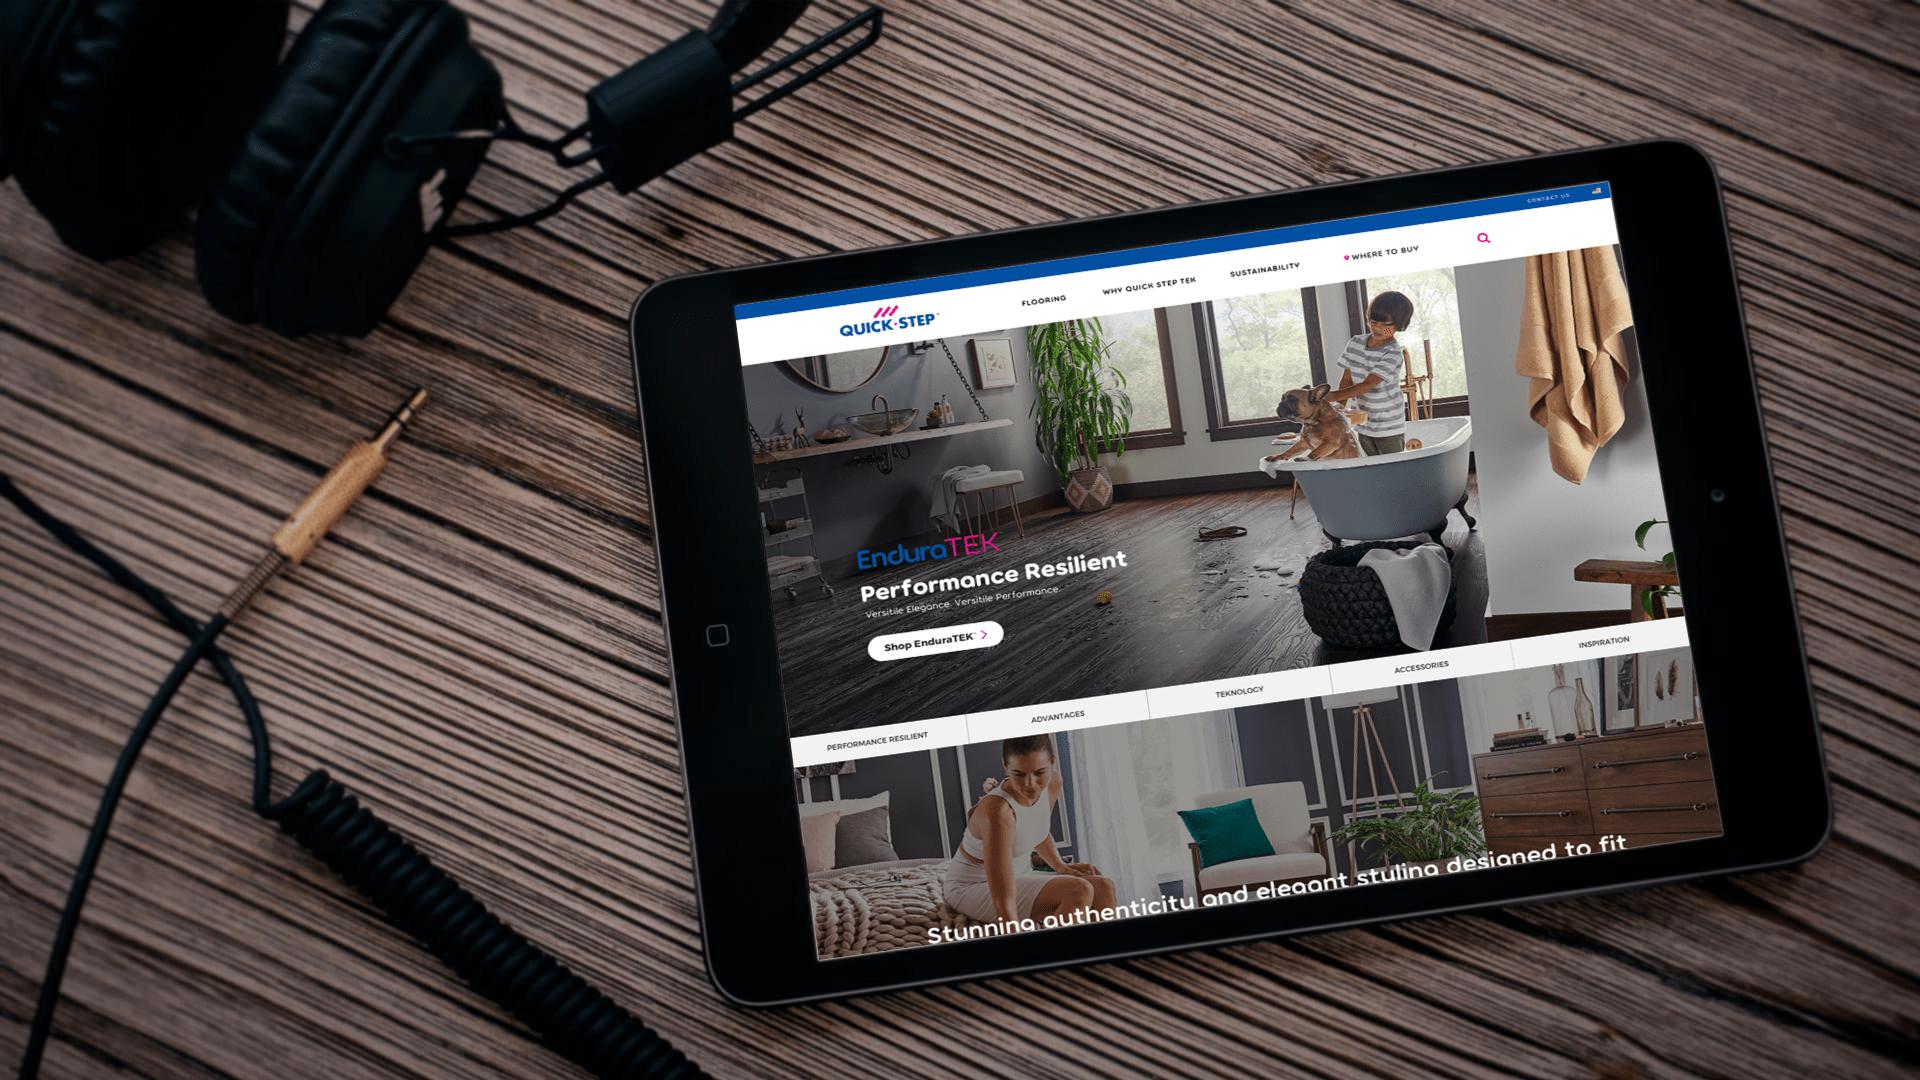 Tablet | Mobile Marketing, LLC